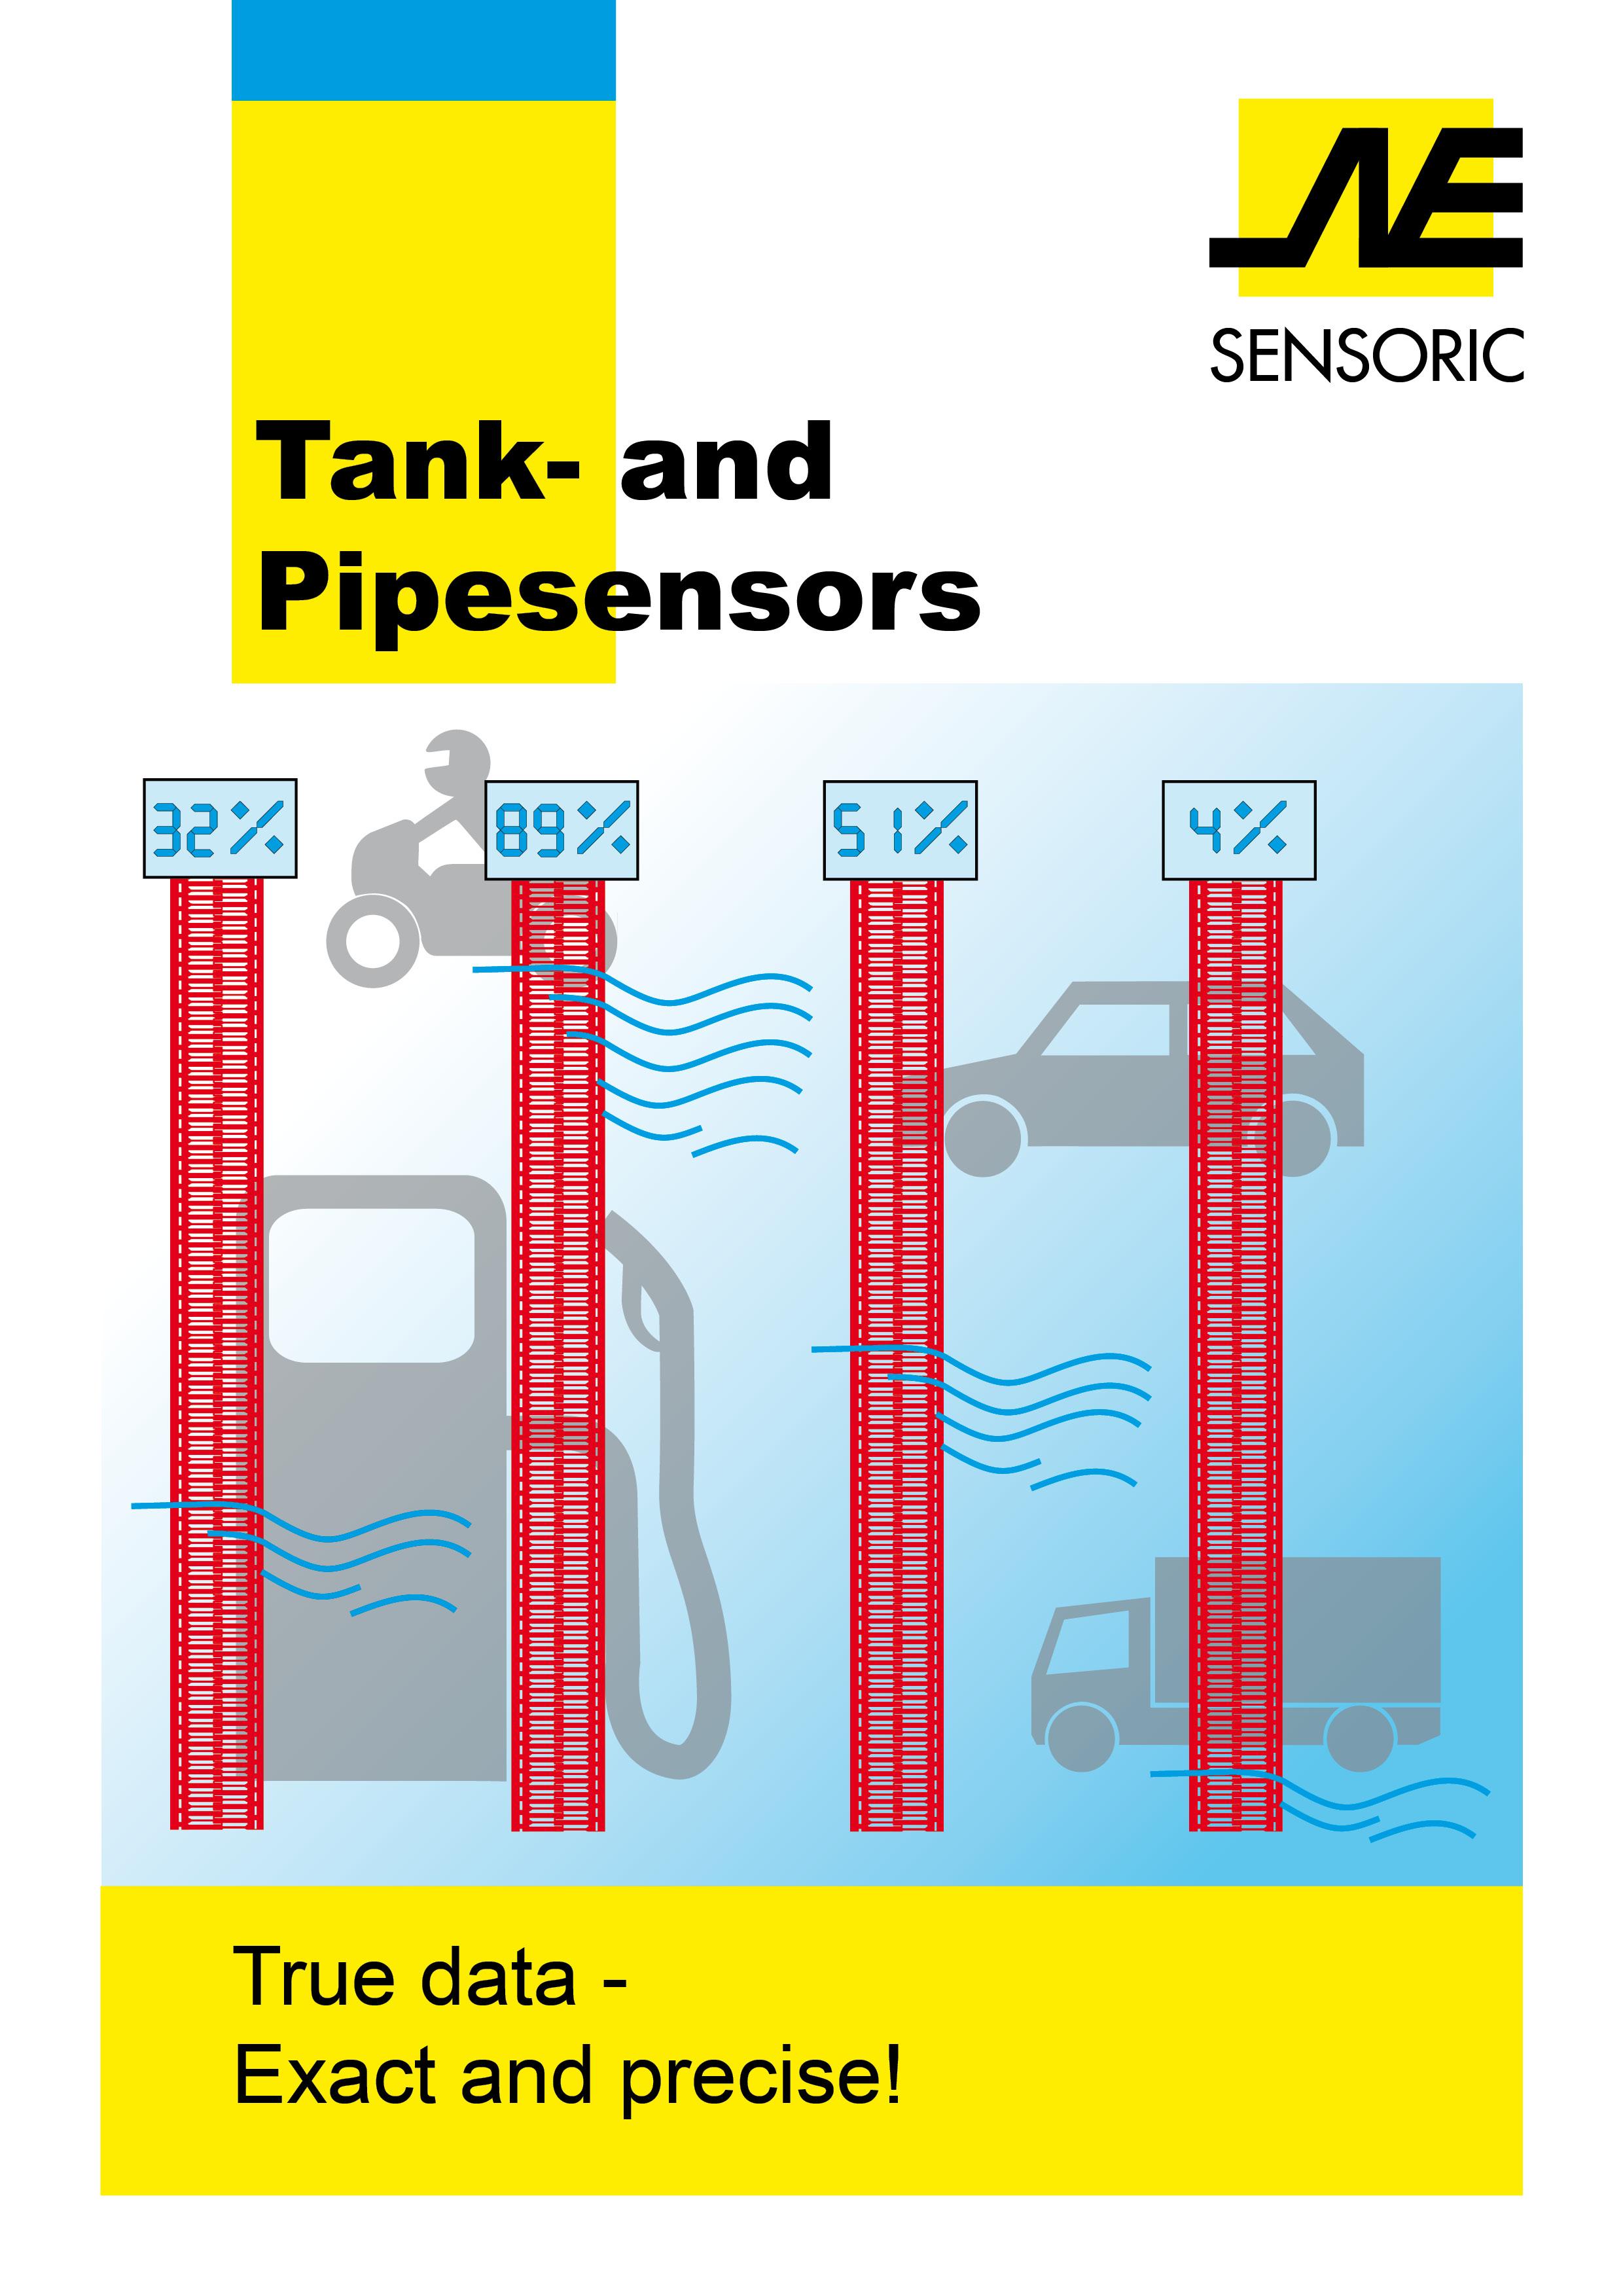 Tanksensors